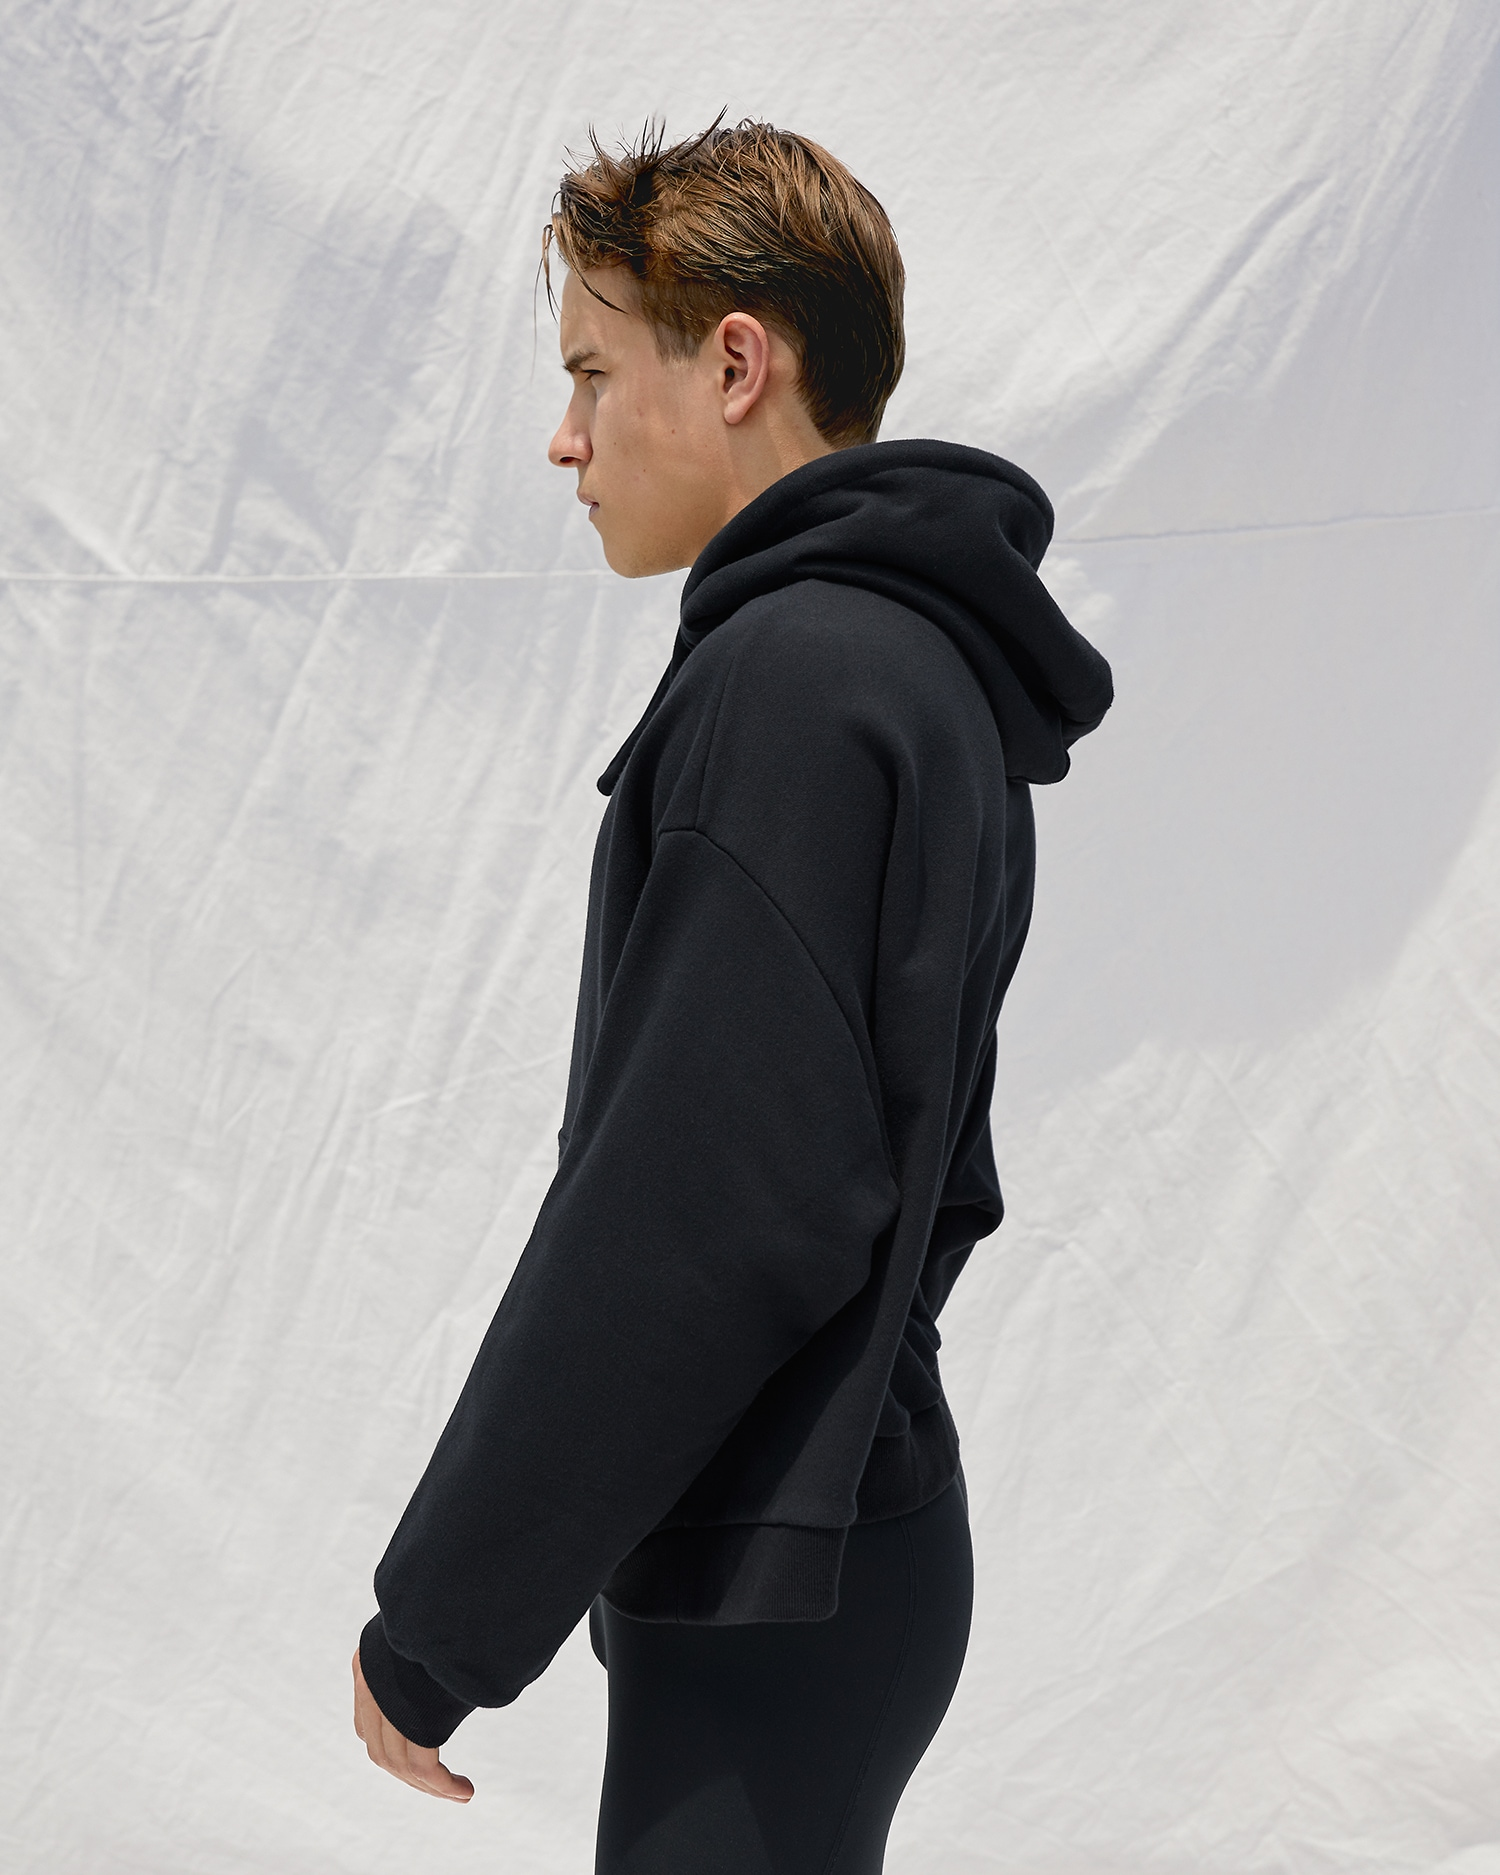 Shop Designer Oversized Hoodie. Unisex. Black.